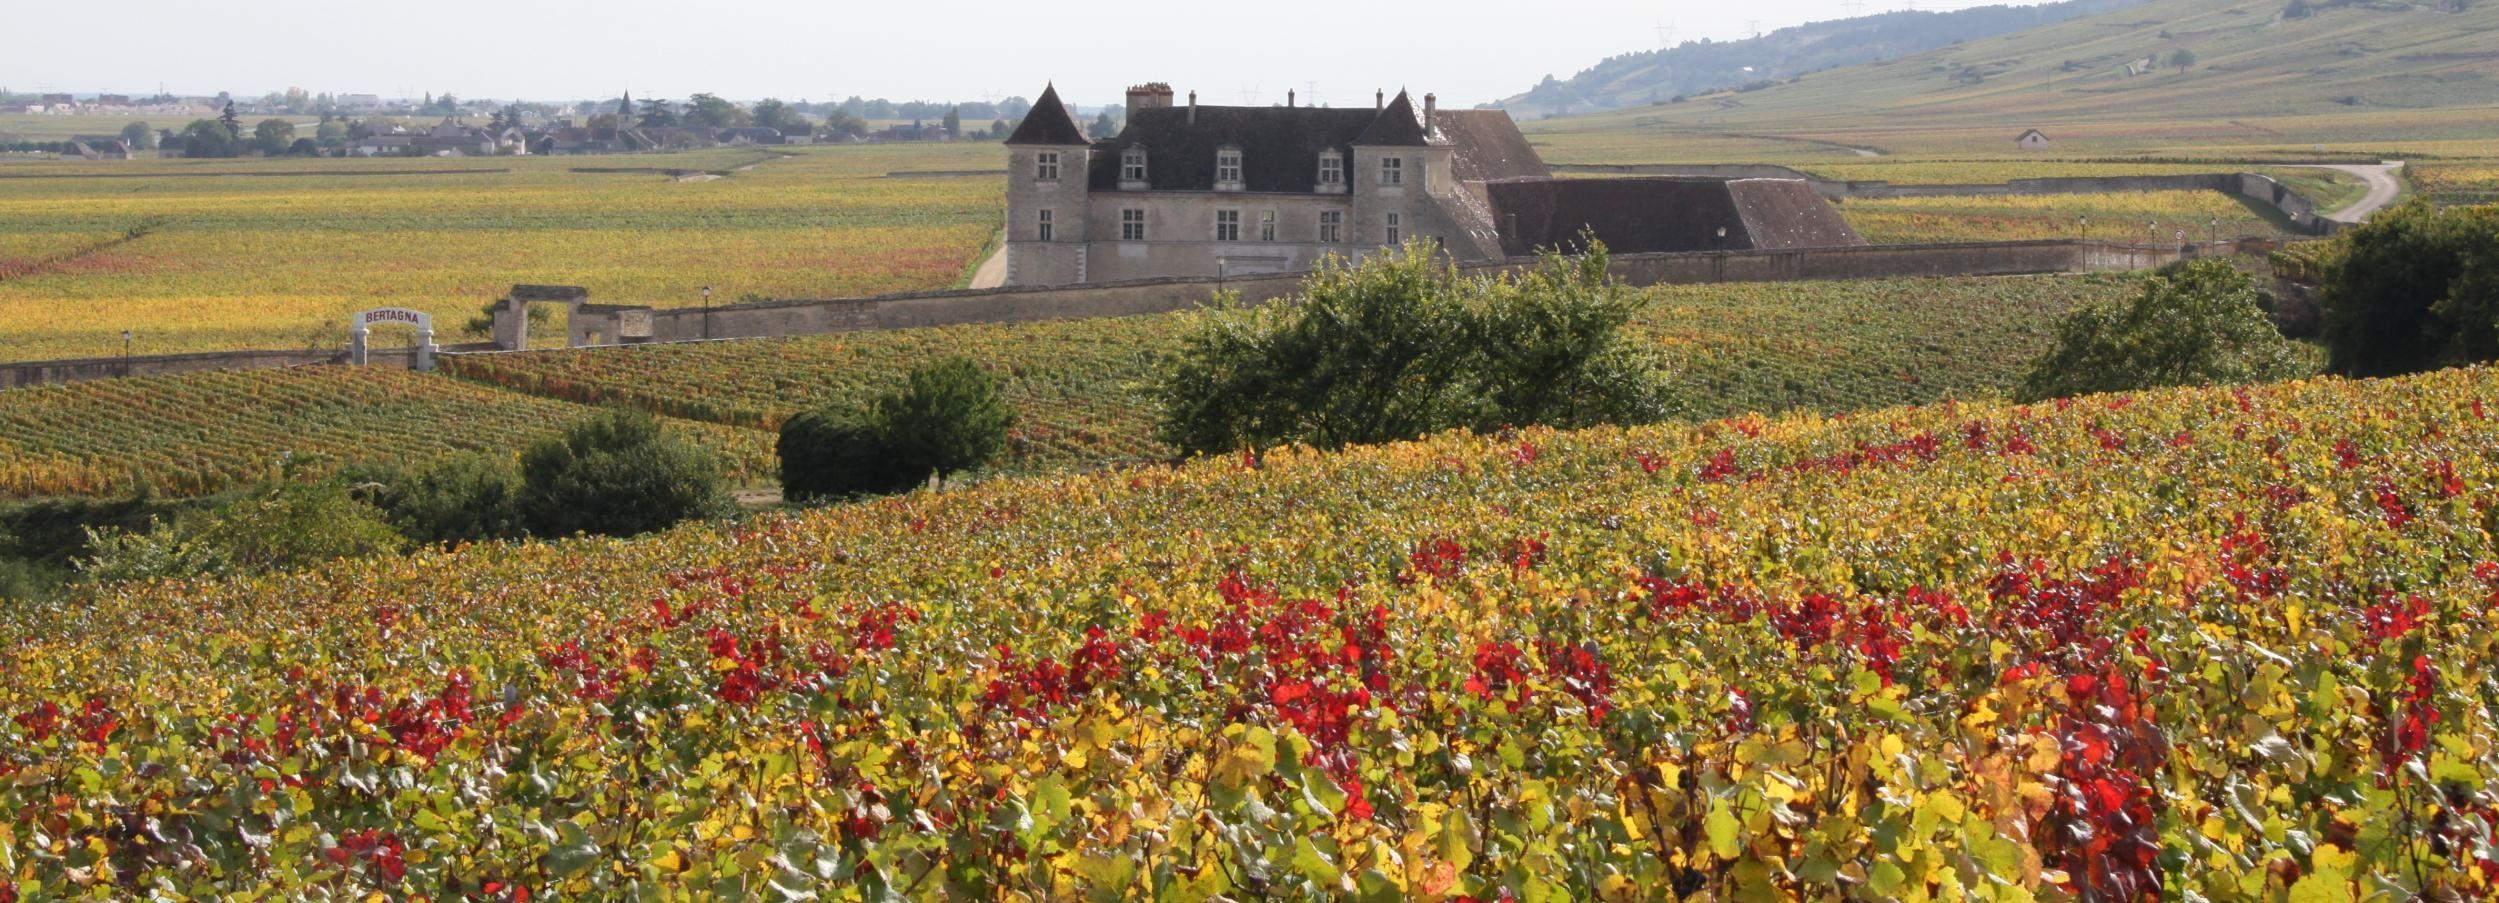 From Beaune: Burgundy 10 Wines Grand Cru Tasting Day Trip